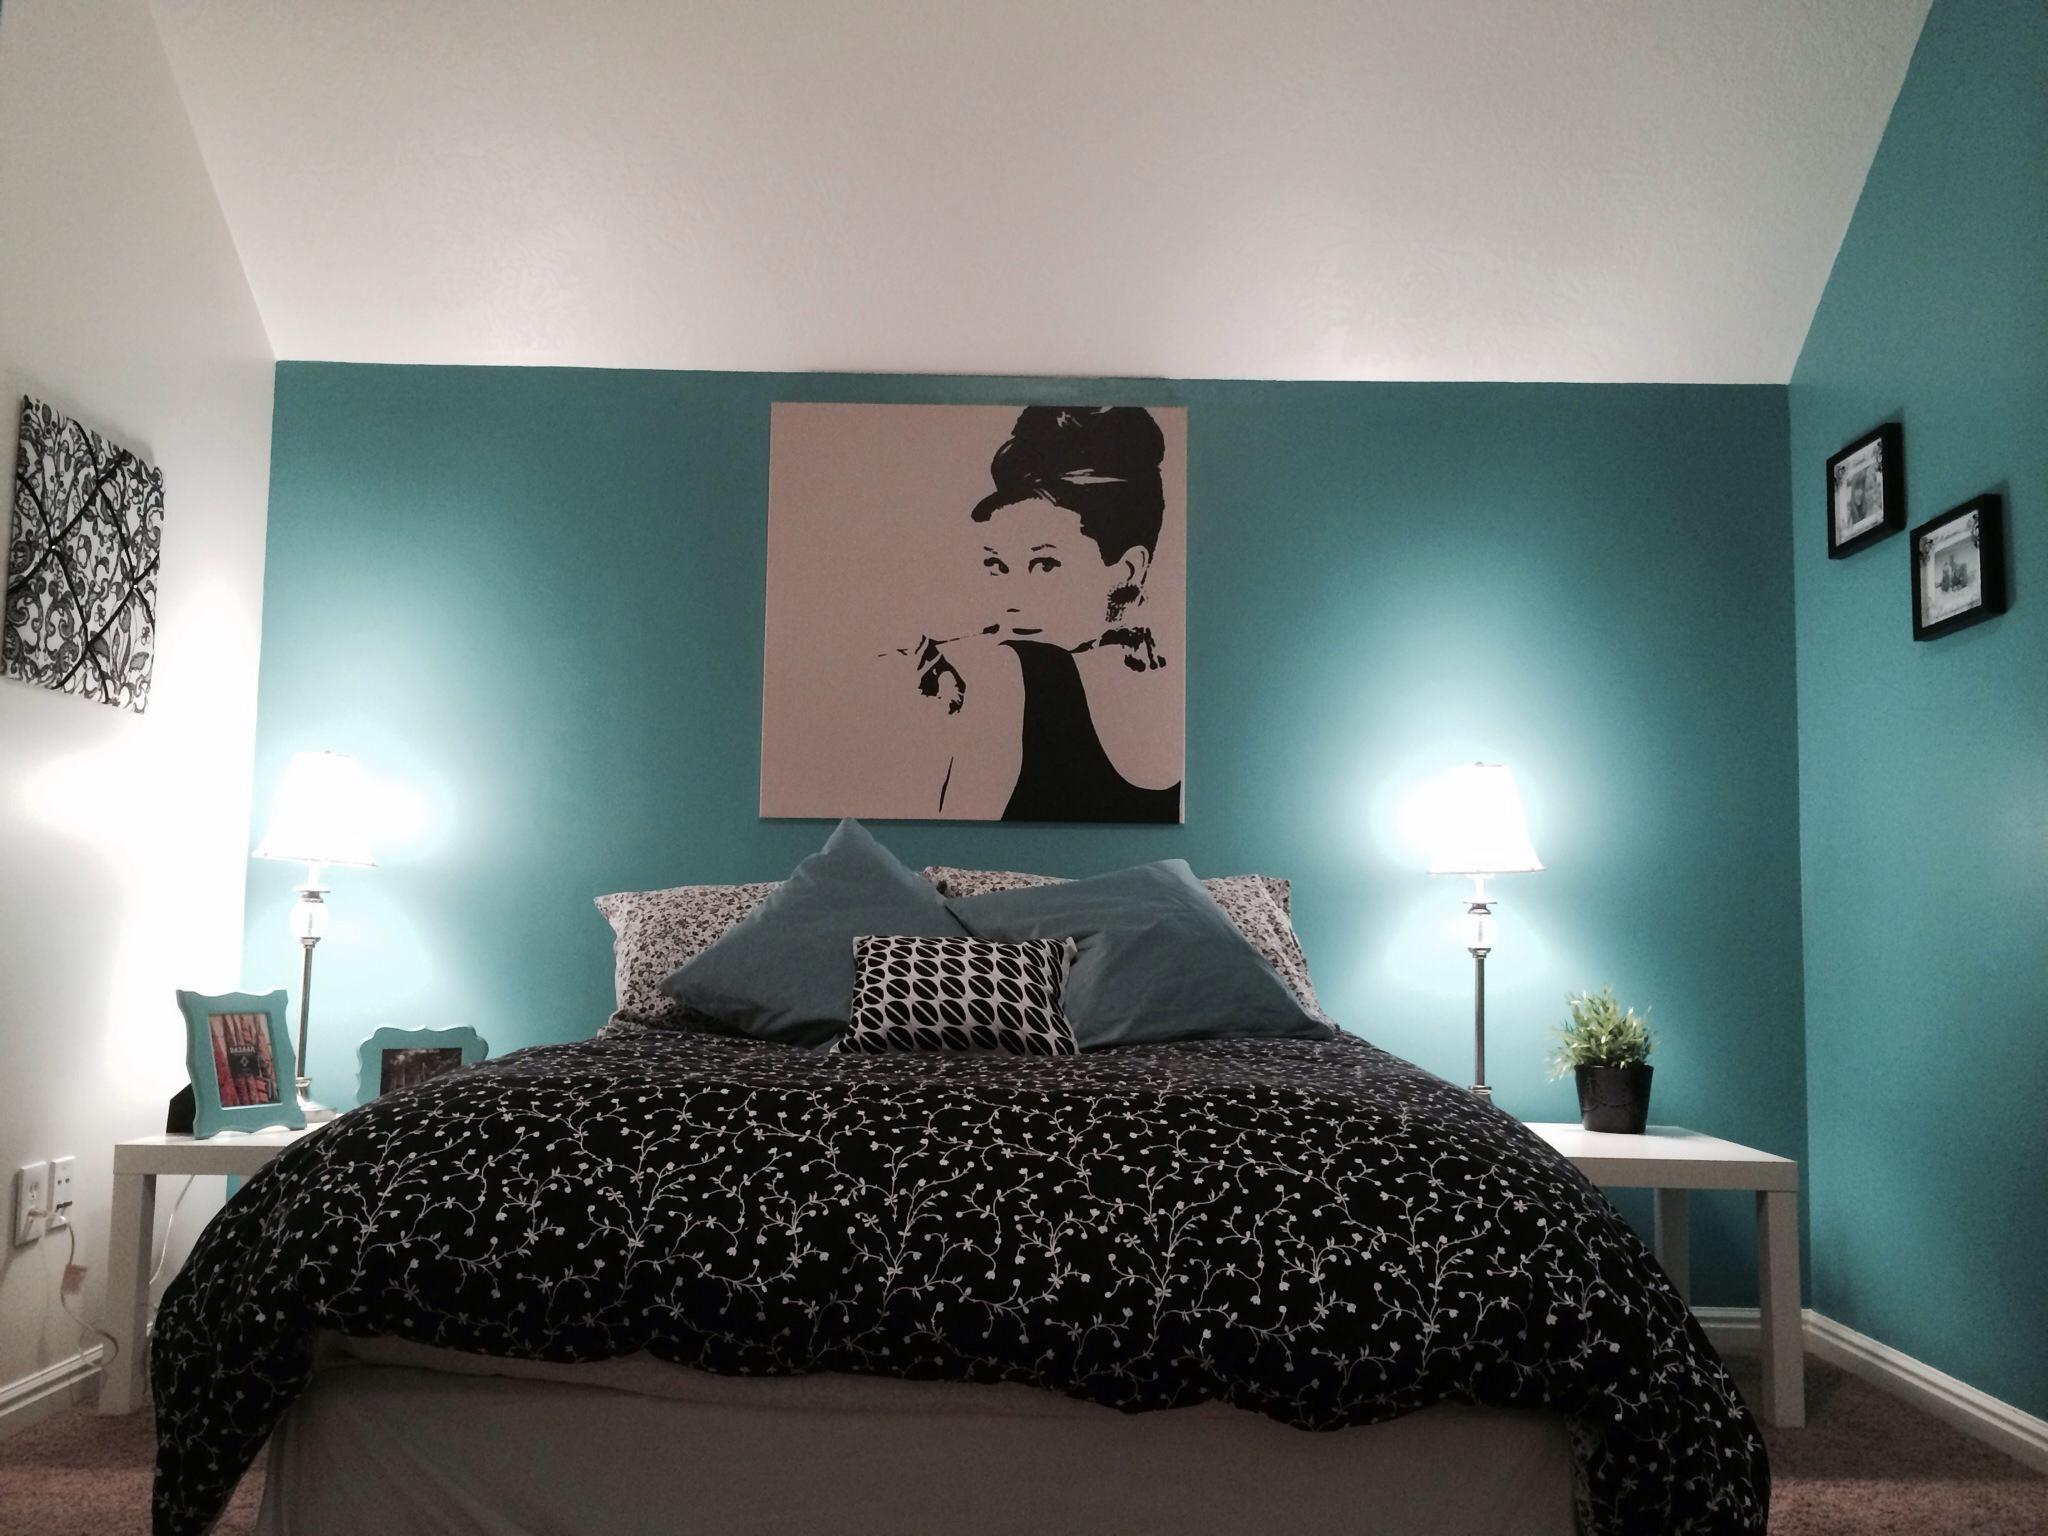 61 quartos azul turquesa tiffany fotos lindas bedrooms 61 quartos azul turquesa tiffany fotos lindas bed roombedroom